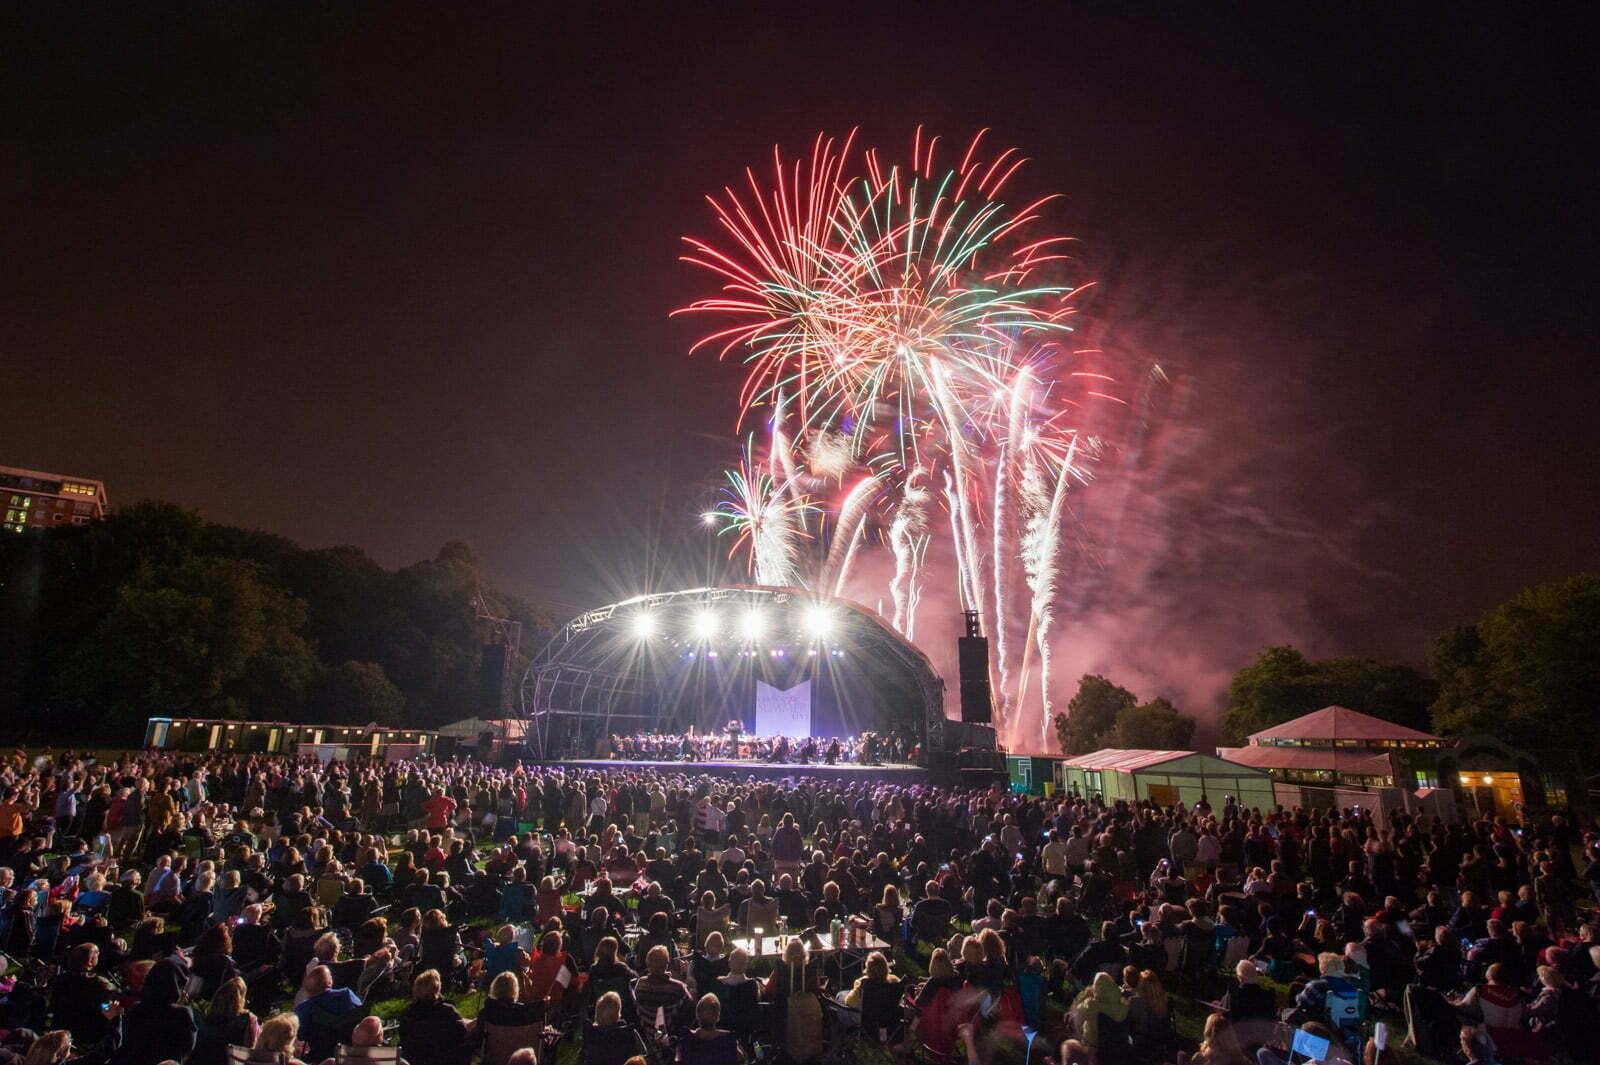 rlpo-limf-fantastic-fireworks-4400